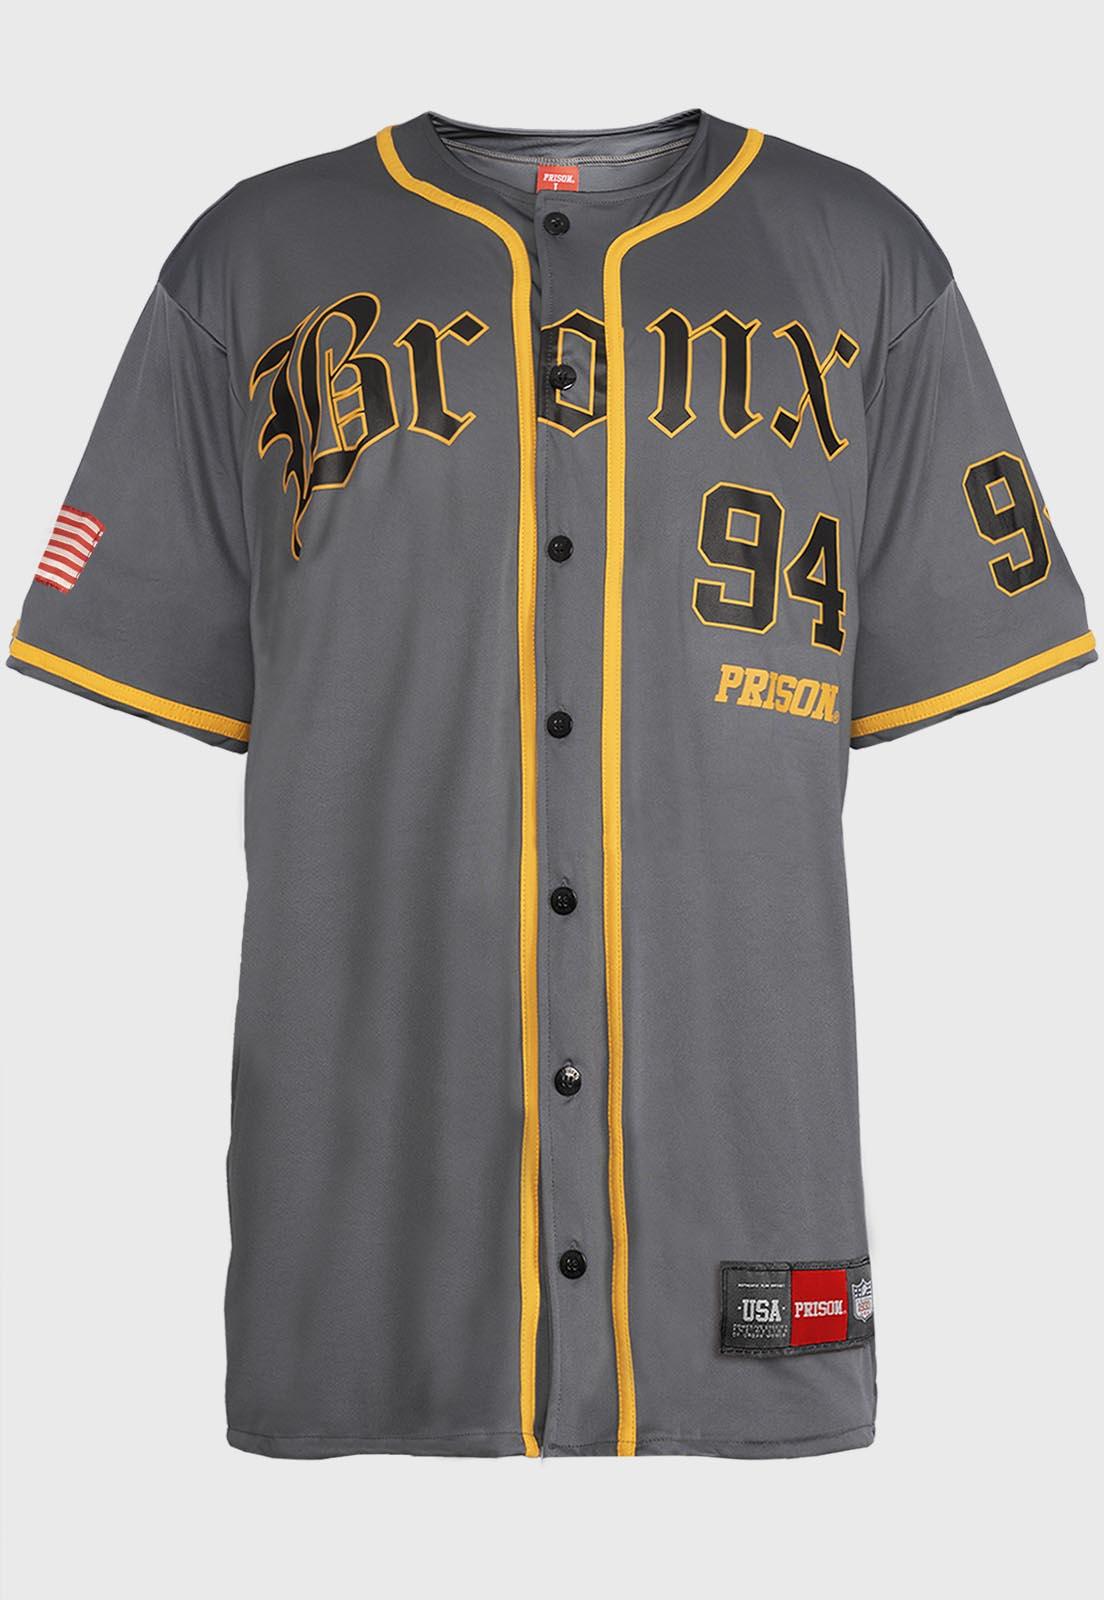 Camisa Baseball Prison Bronx 94